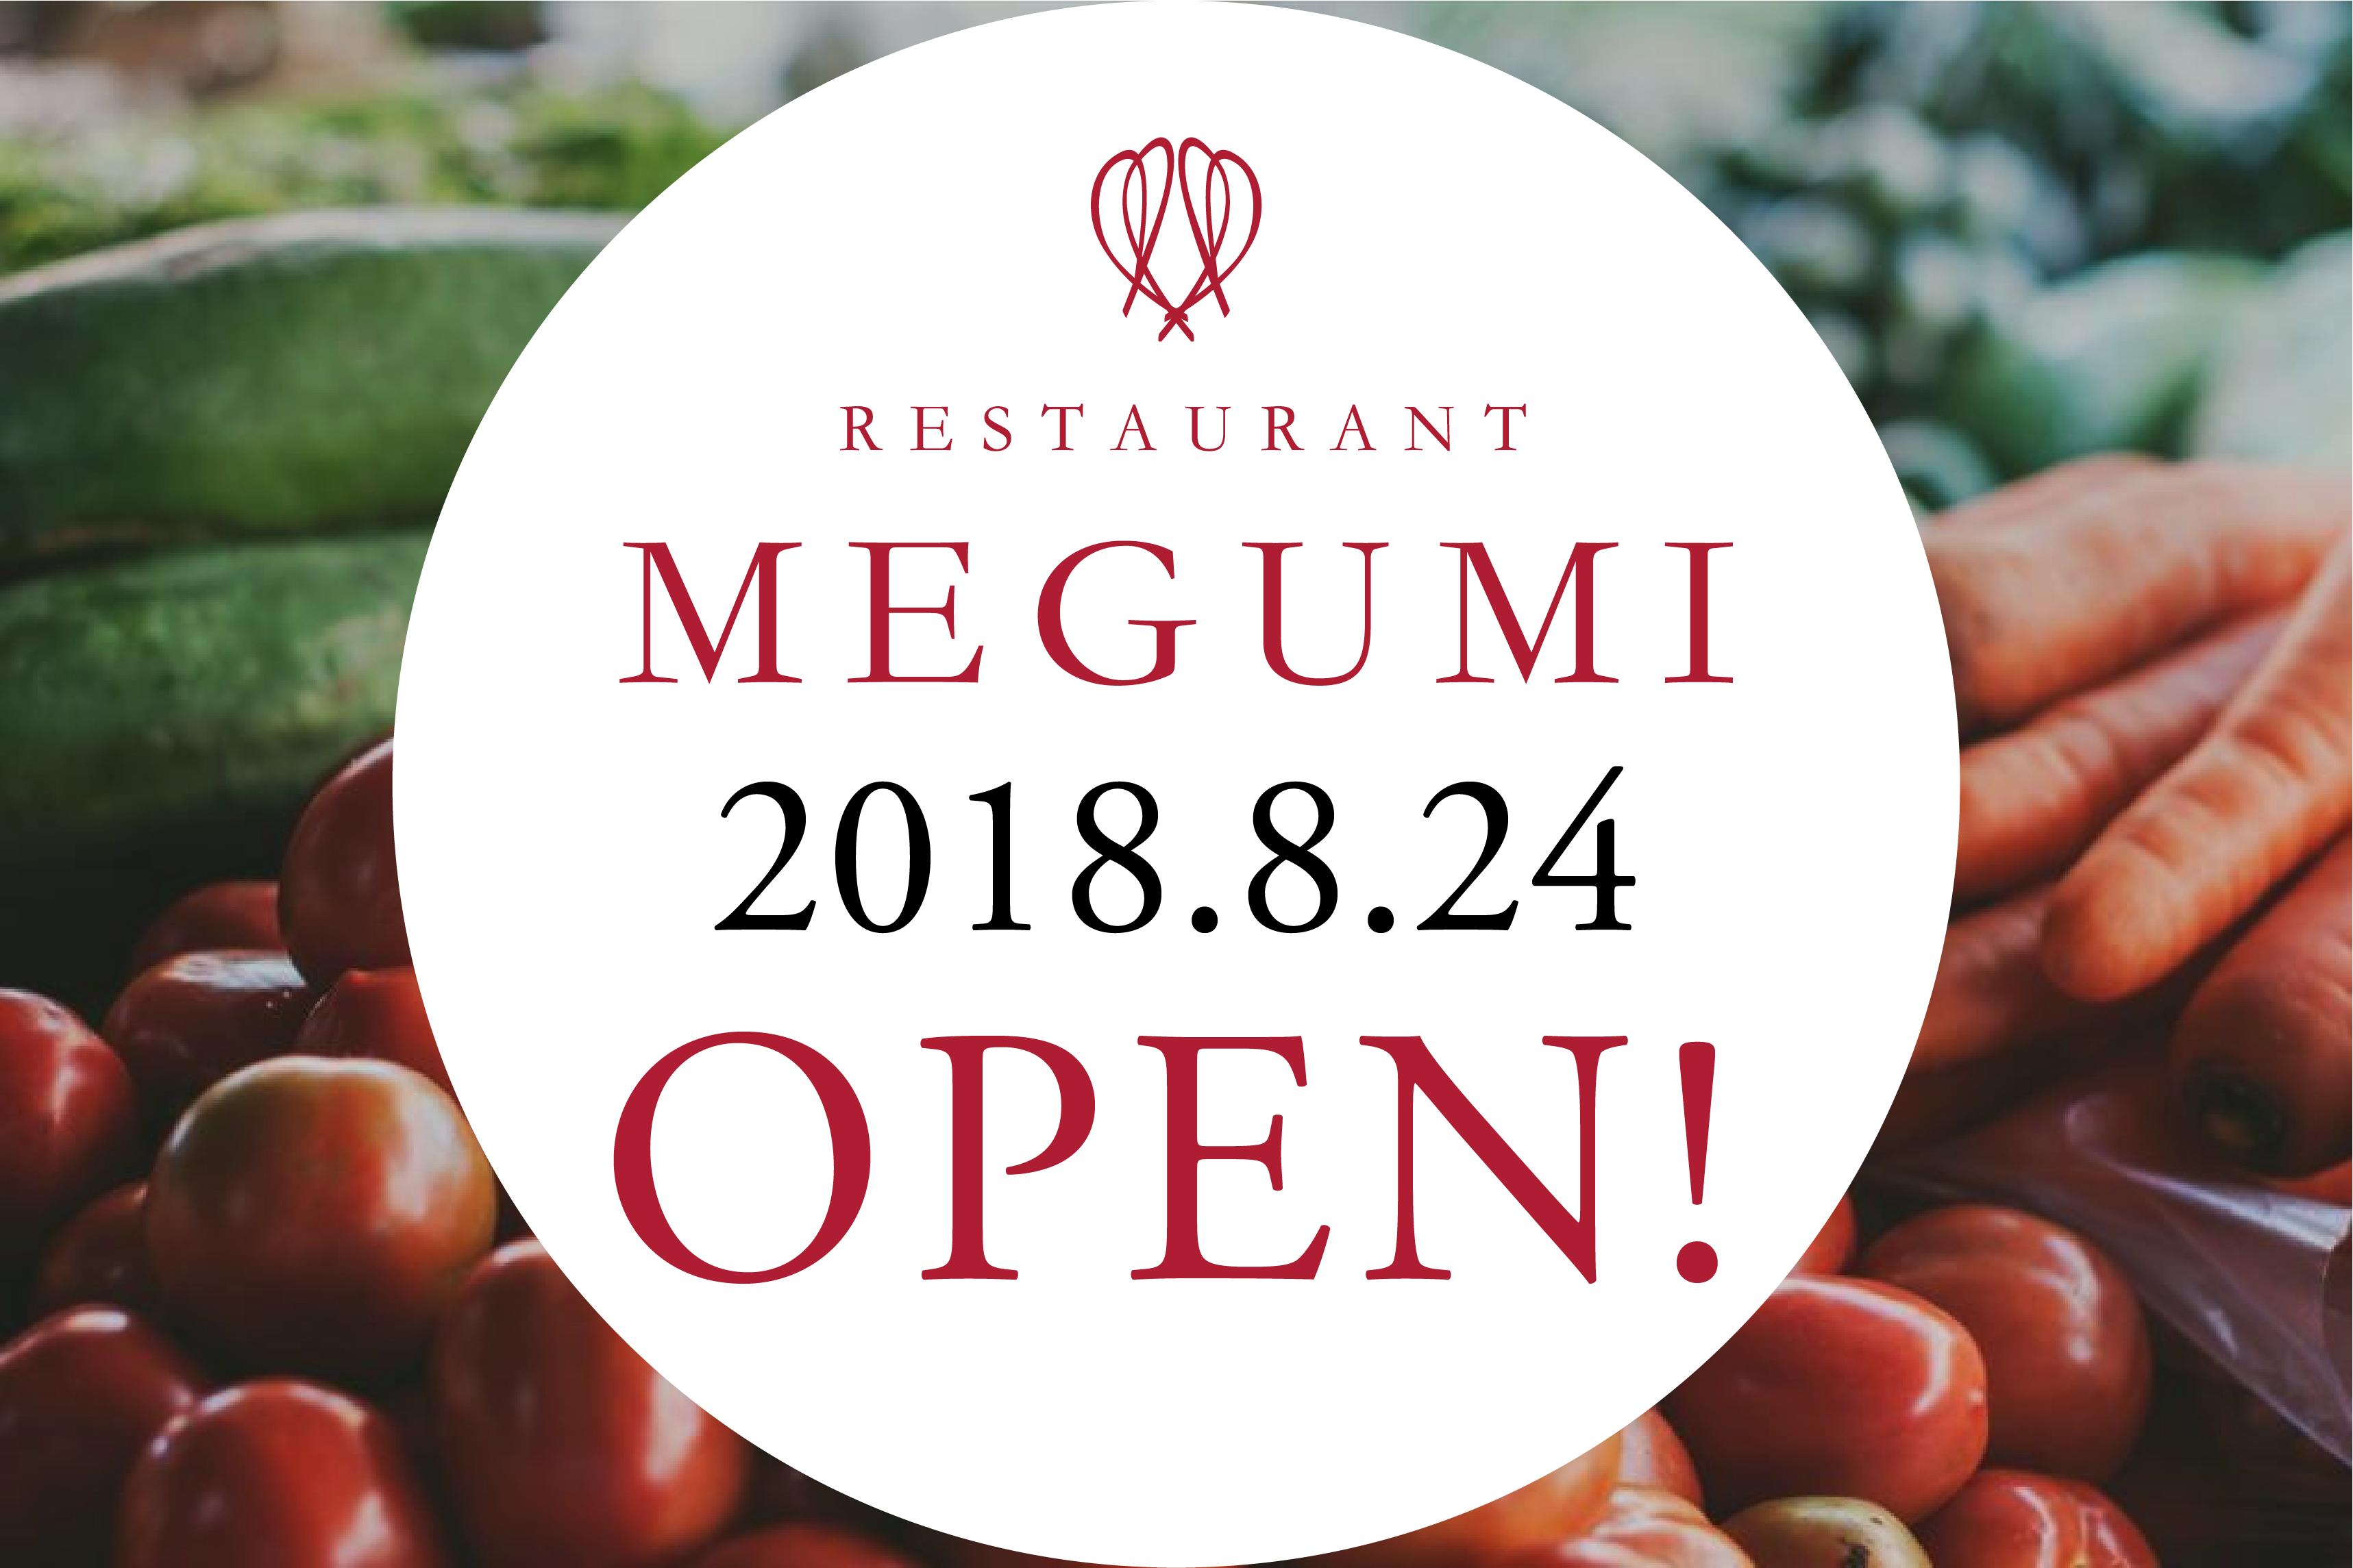 RESTAURANT MEGUMI 2018.8月下旬OPEN